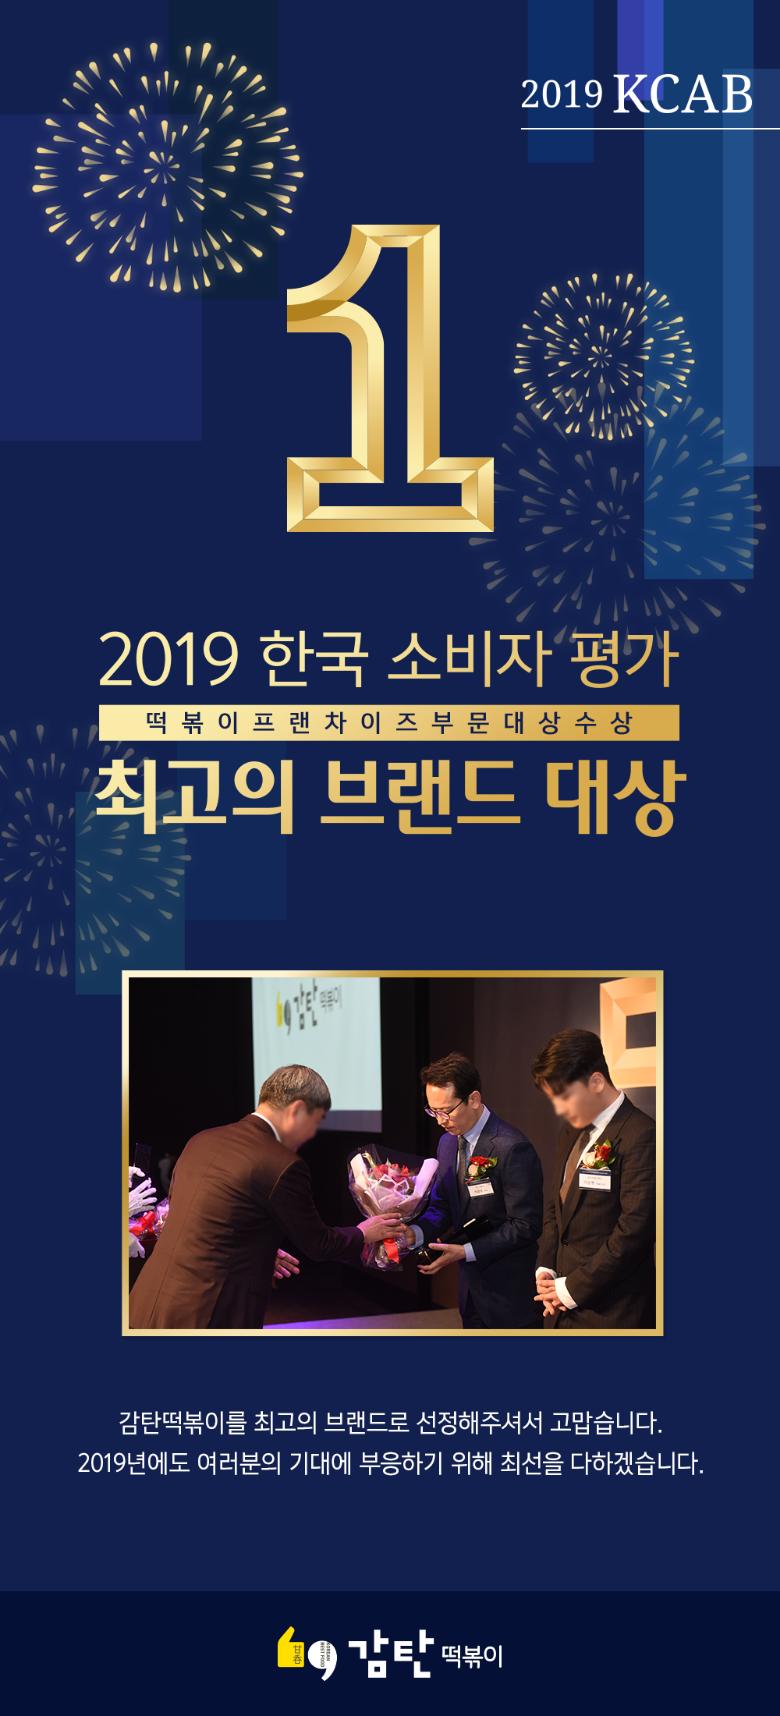 2019 KCAB 한국 소비자 평가 최고의 브랜드 대상 떡볶이 프랜차이즈 부문 대상 수상감탄떡볶이를 최고의 브랜드로 선정해주셔서 고맙습니다. 2019년에도 여러분의 기대에 부응하기 위해 최선을 다하겠습니다.